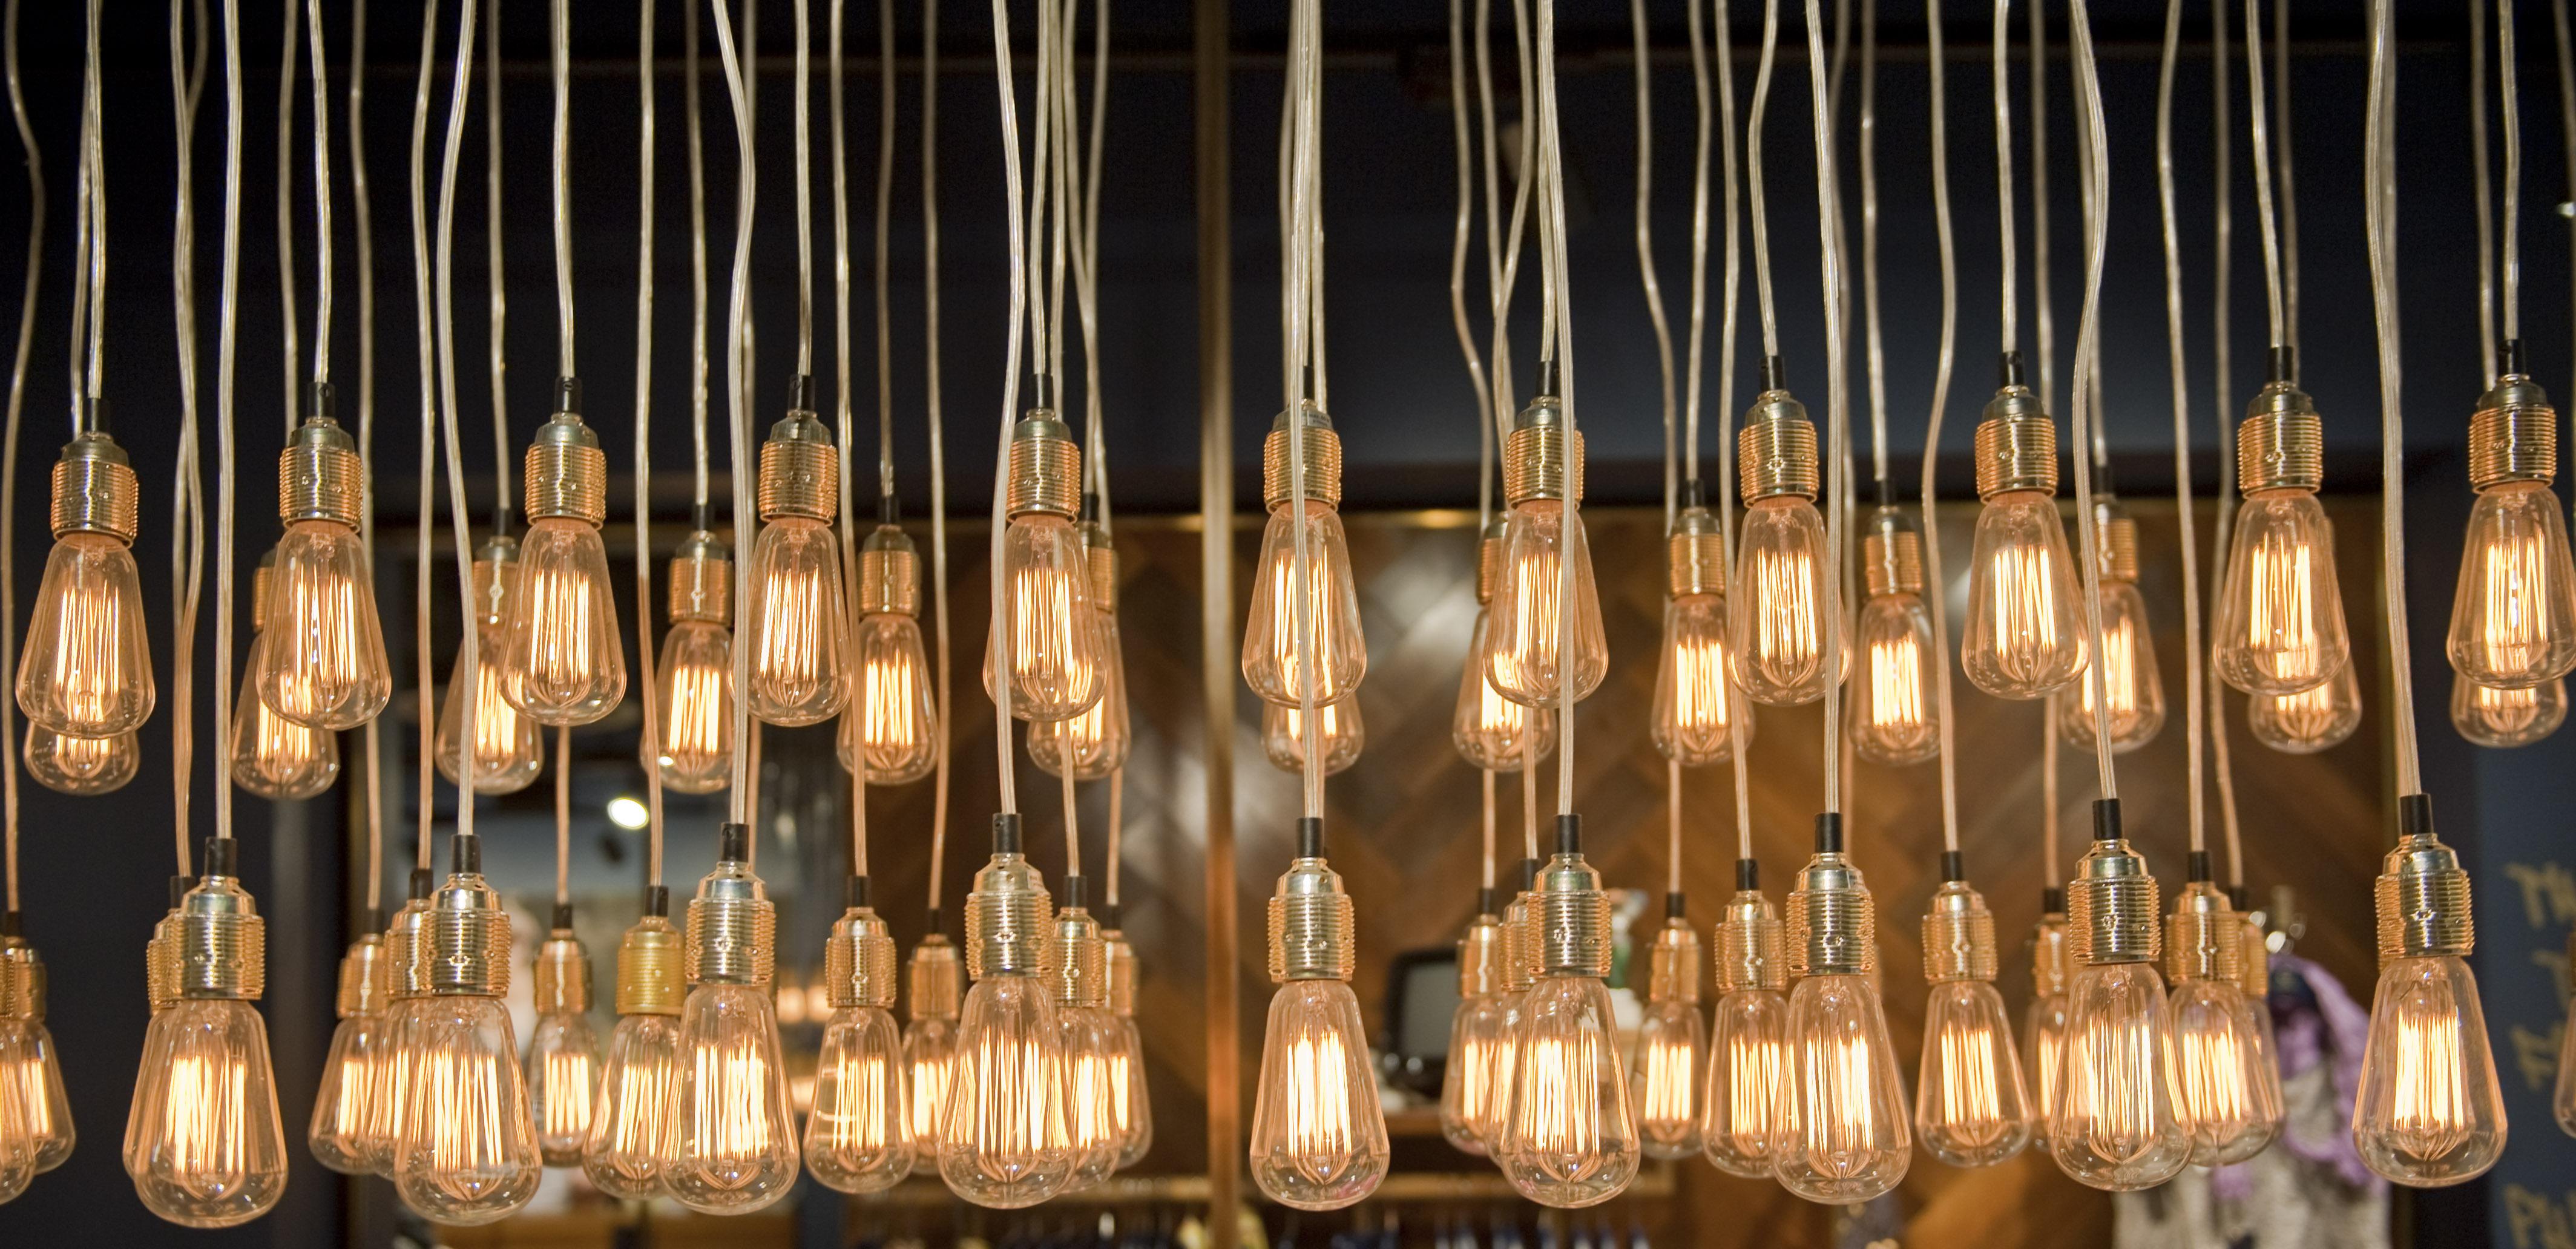 a series of lightbulbs